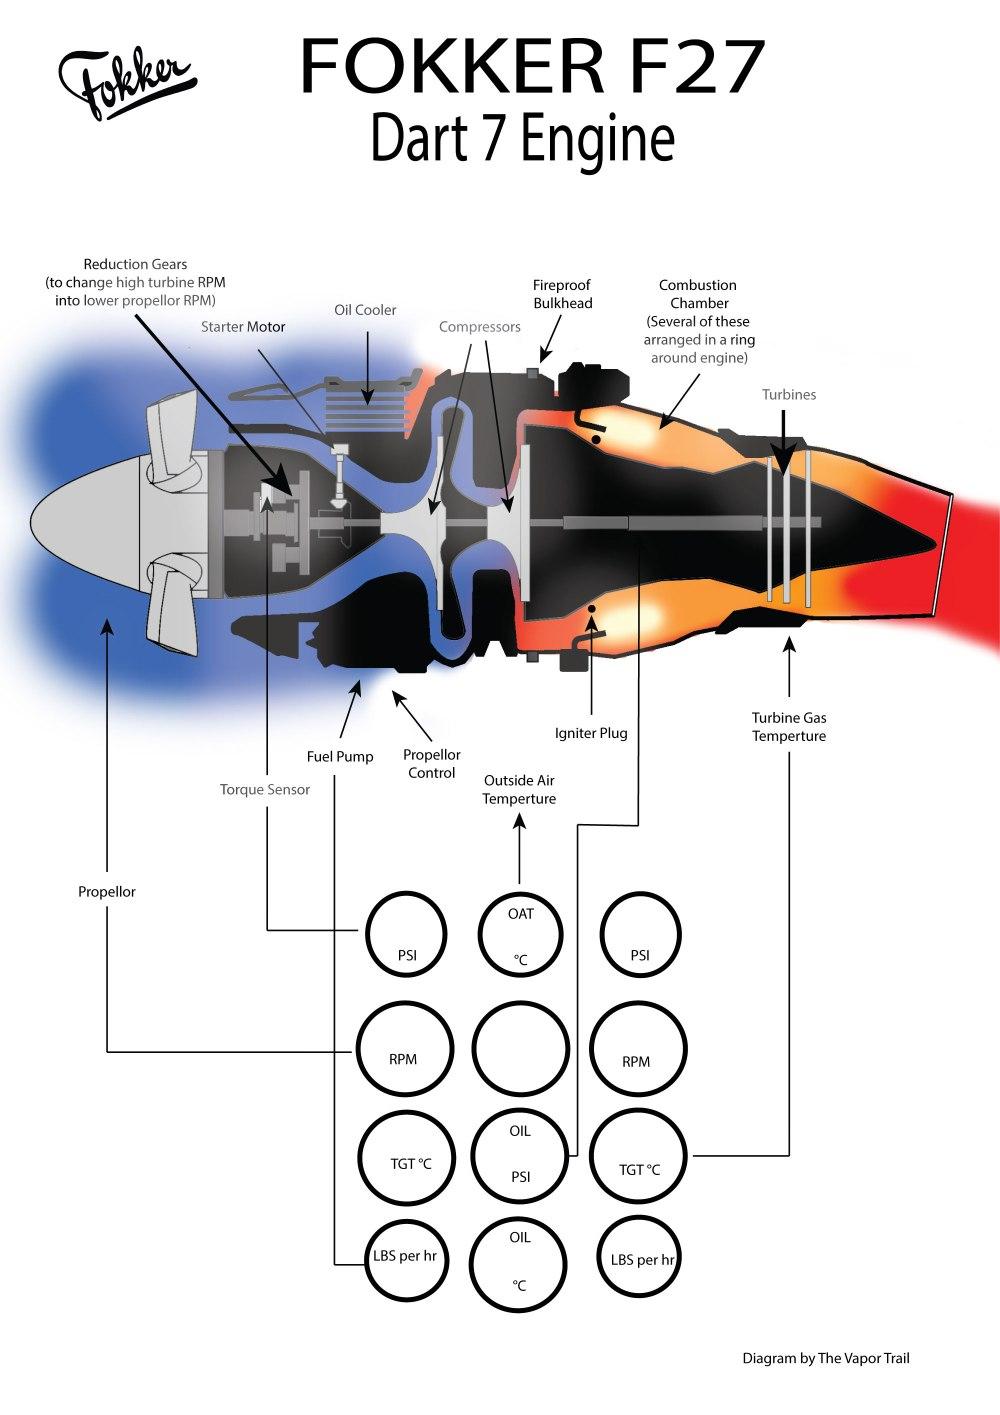 small resolution of fokker f27 dart 7 engine diagram